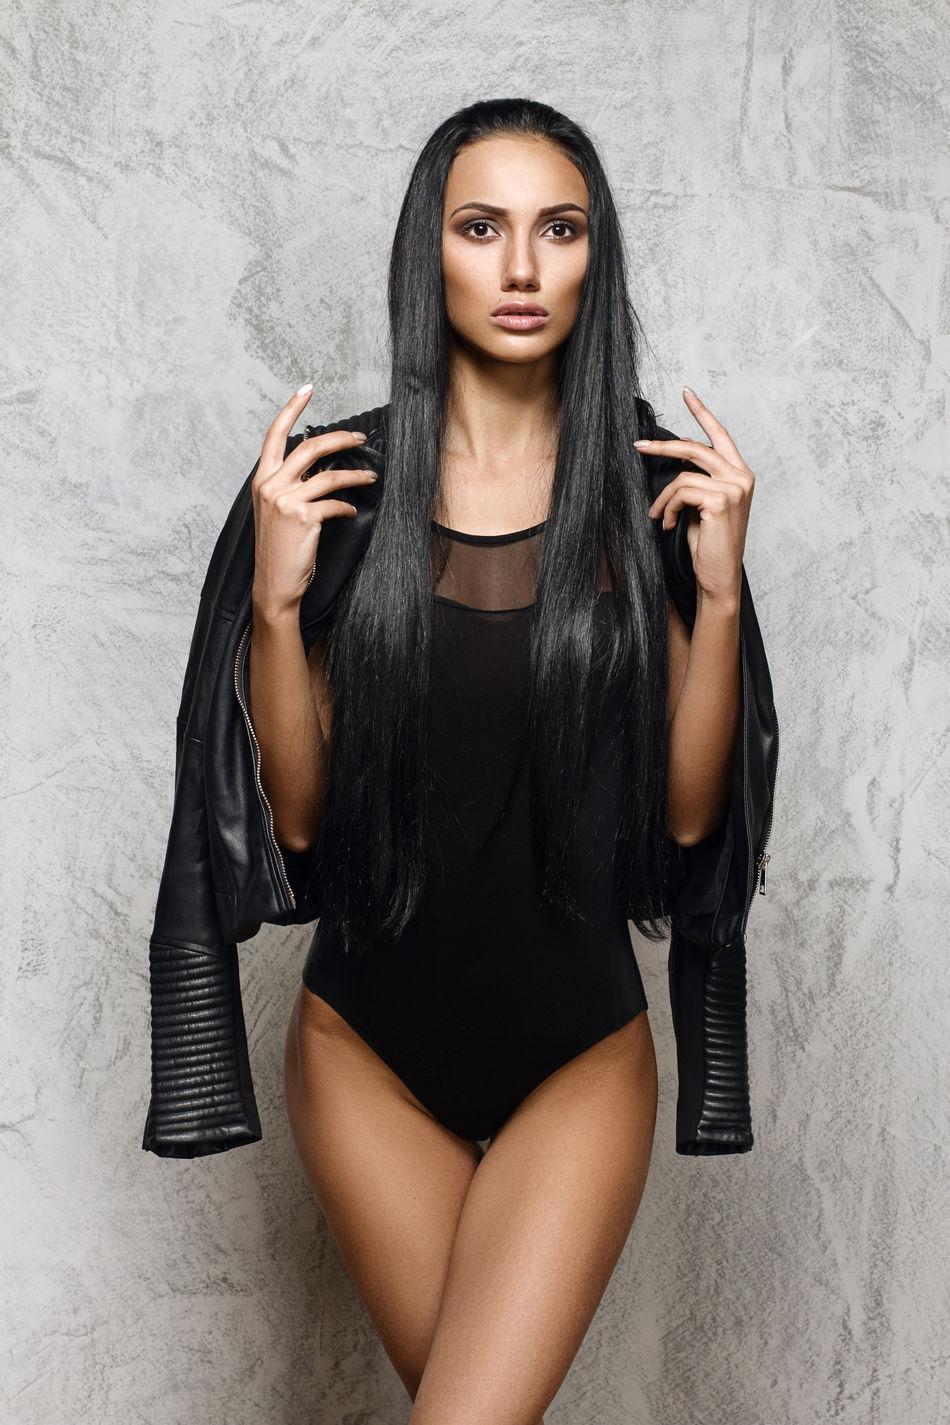 Beautiful stock photos of fashion, 18-19 Years, Beautiful Woman, Black, Black Hair